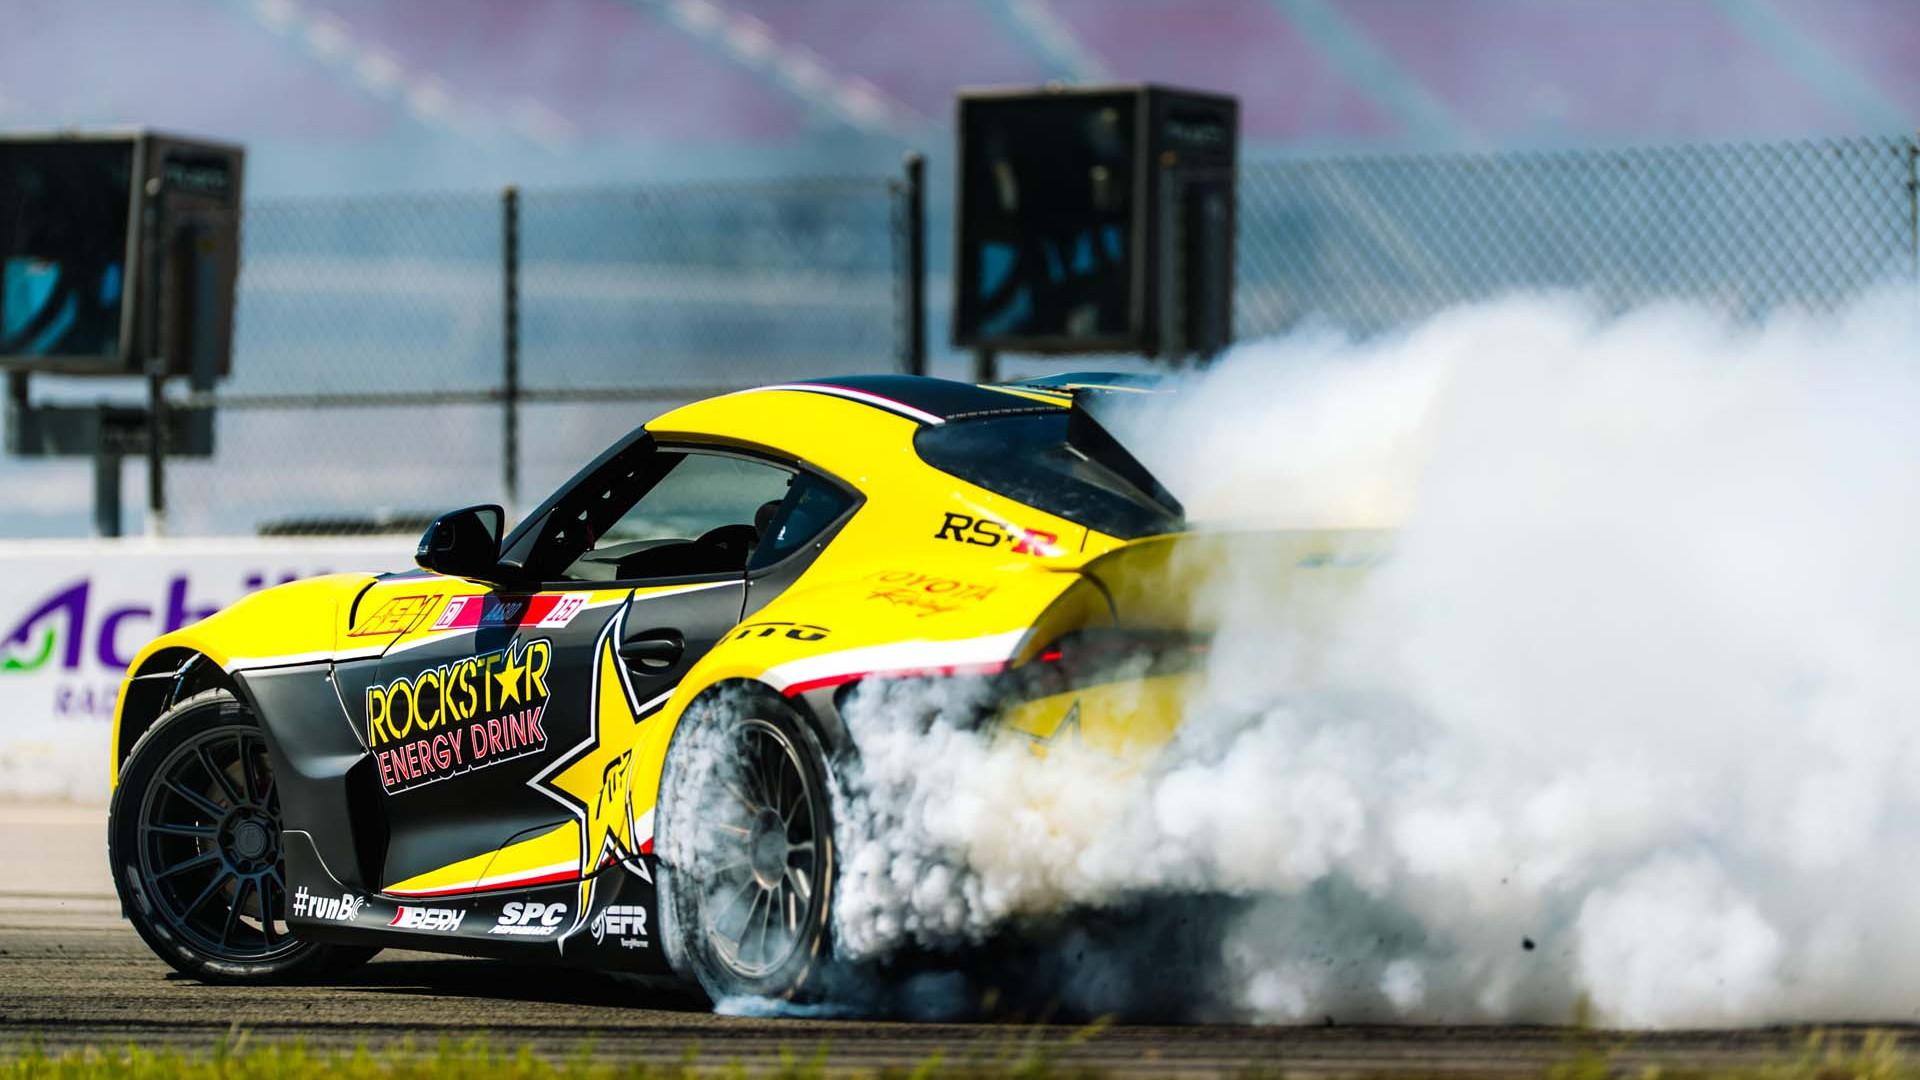 Papadakis Racing Rockstar Energy Drink 2021 Toyota Supra drift car